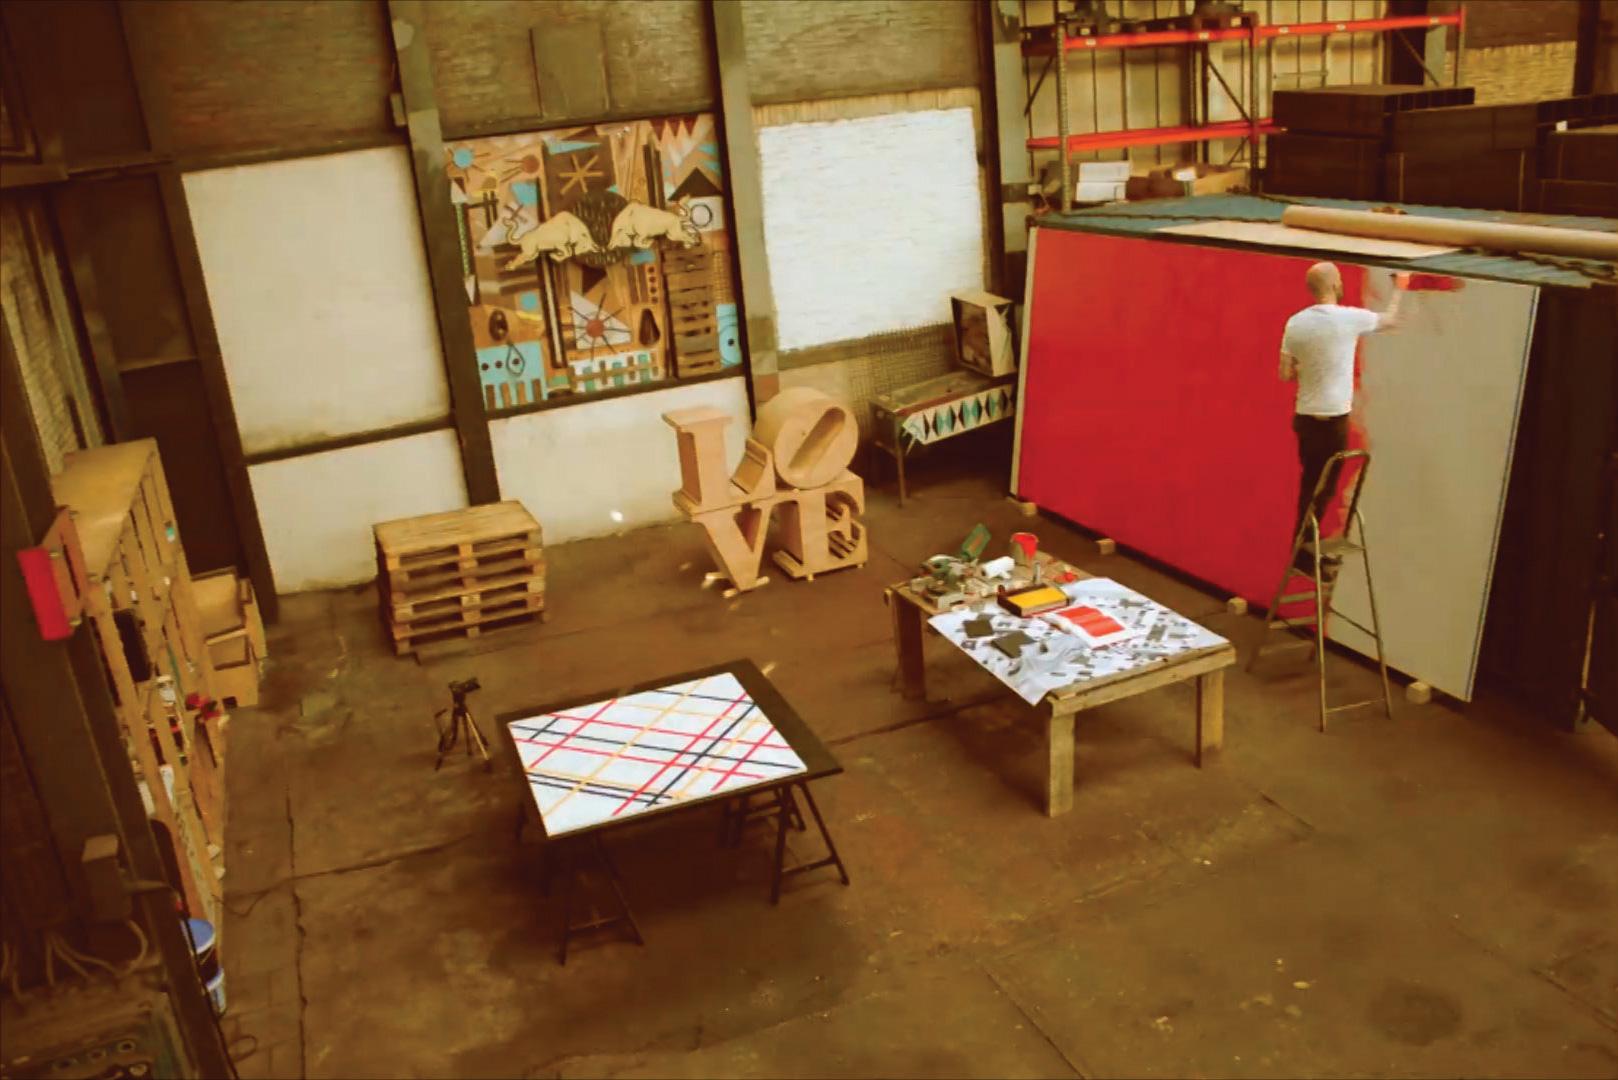 redbull-creativestudio-02